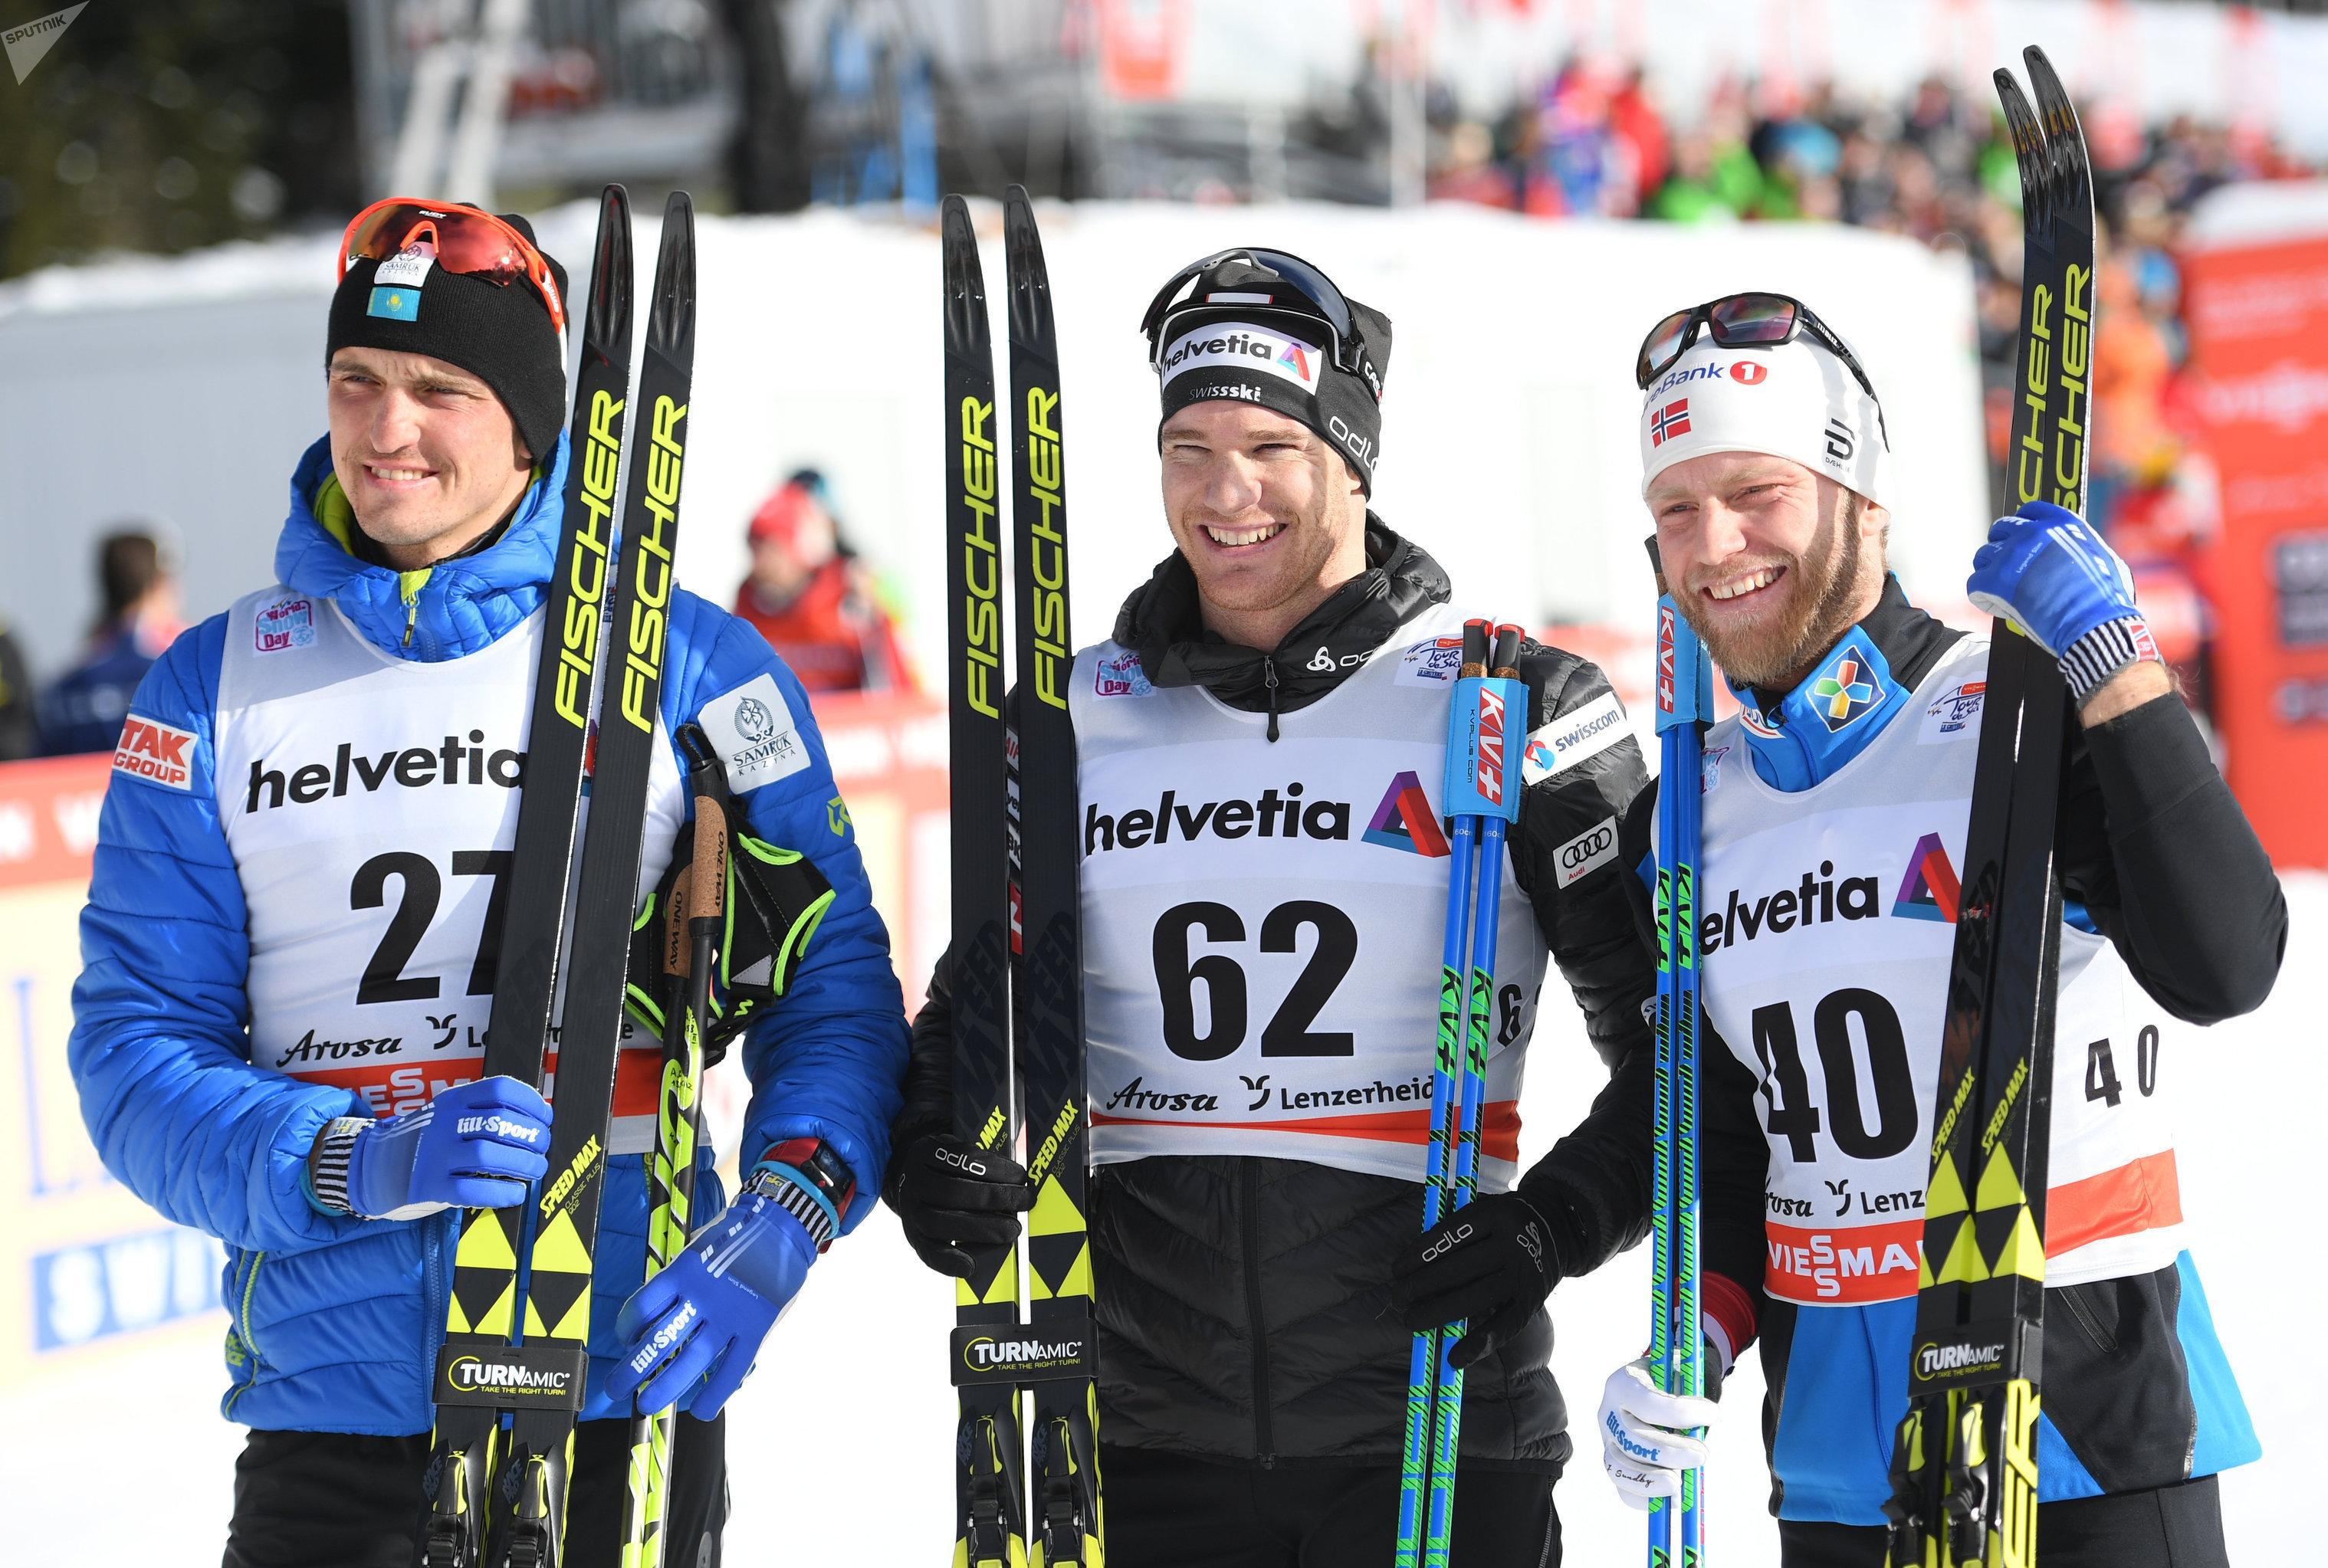 Призеры гонки на 15 км классическим стилем Тур де Ски (слева направо): Алексей Полторанин, Дарио Колонья, Мартин Йонсруд Сундбю